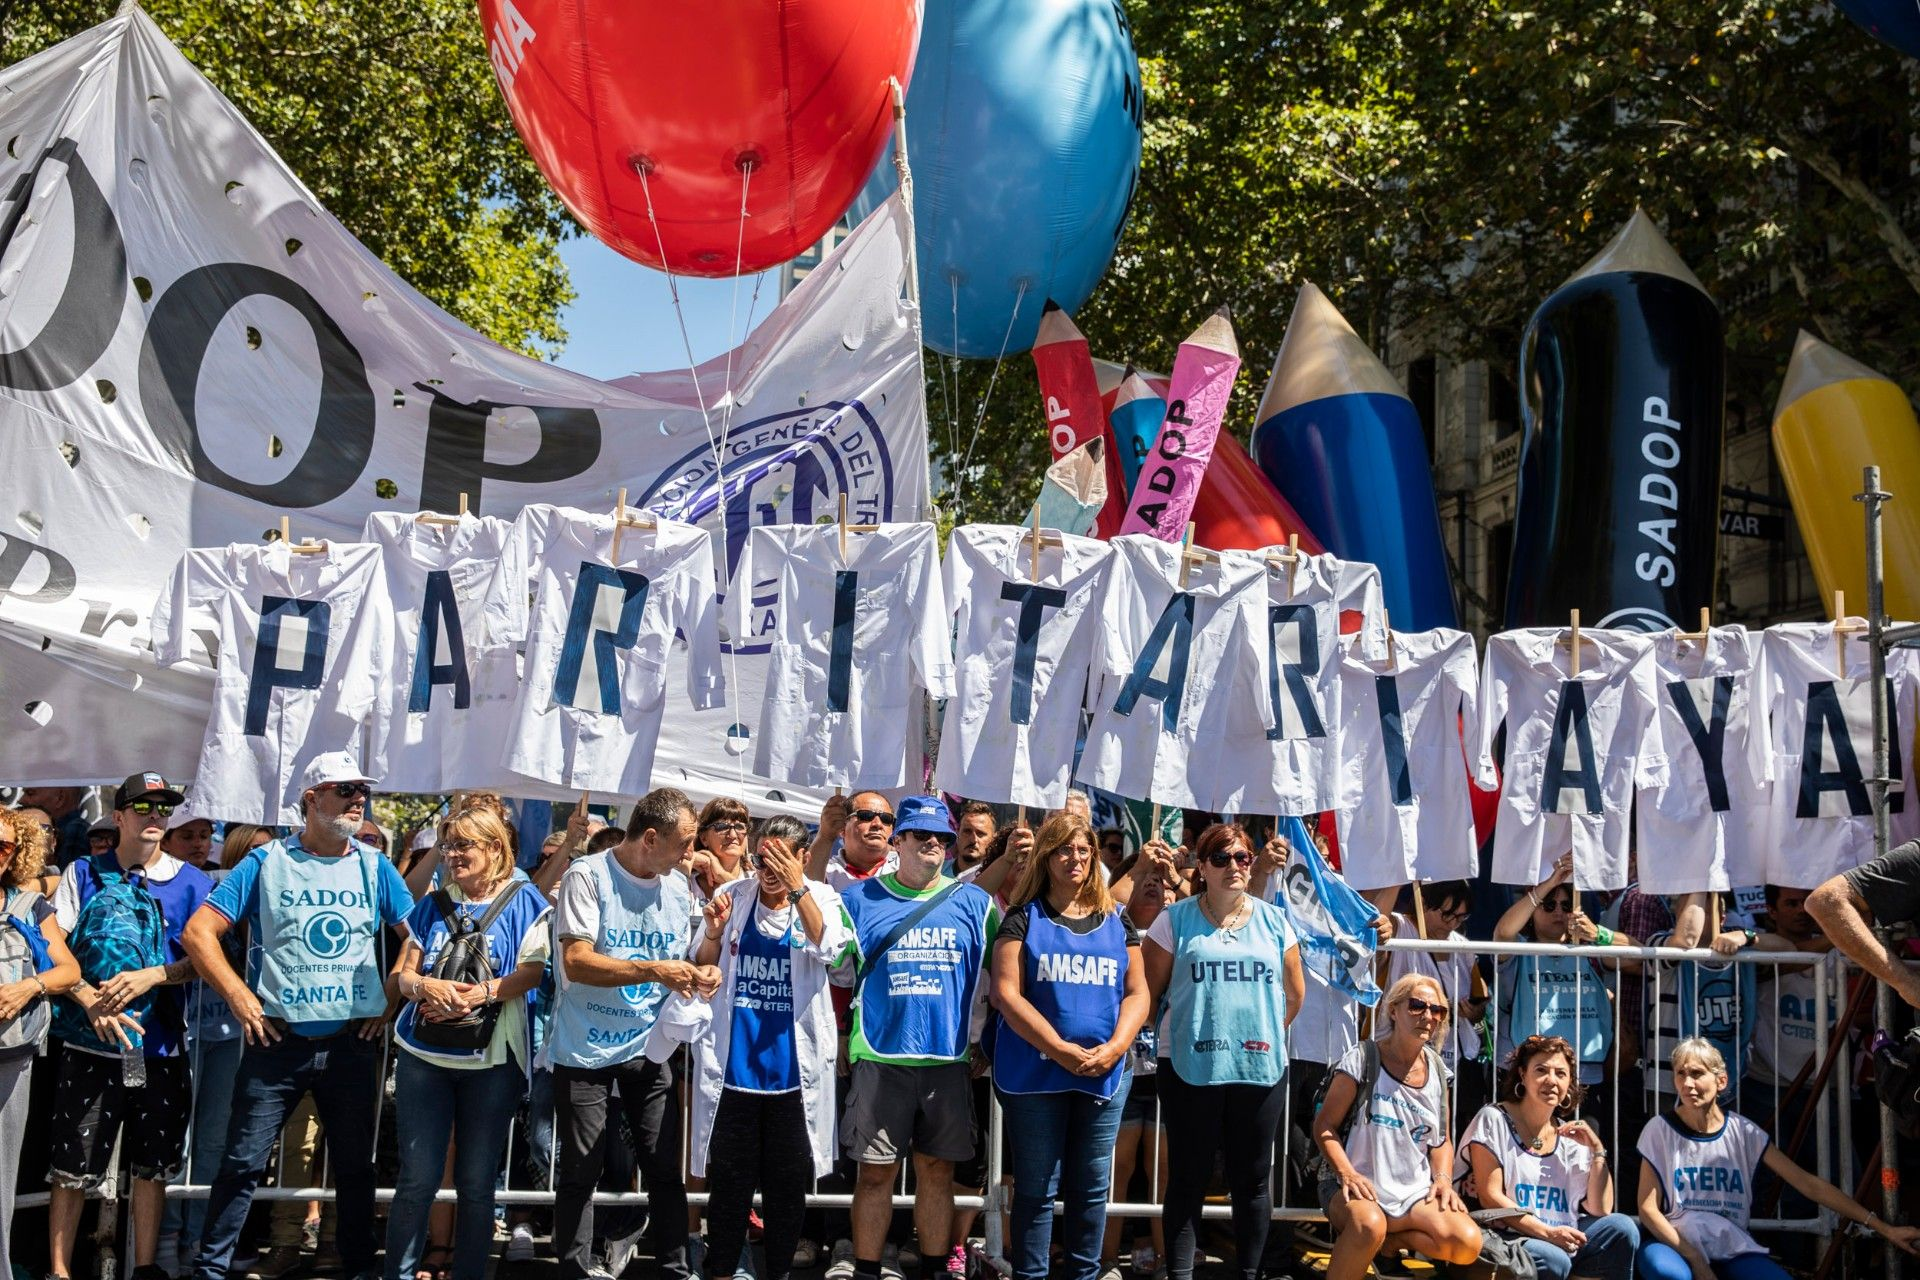 Foto: Nicolás Cardello